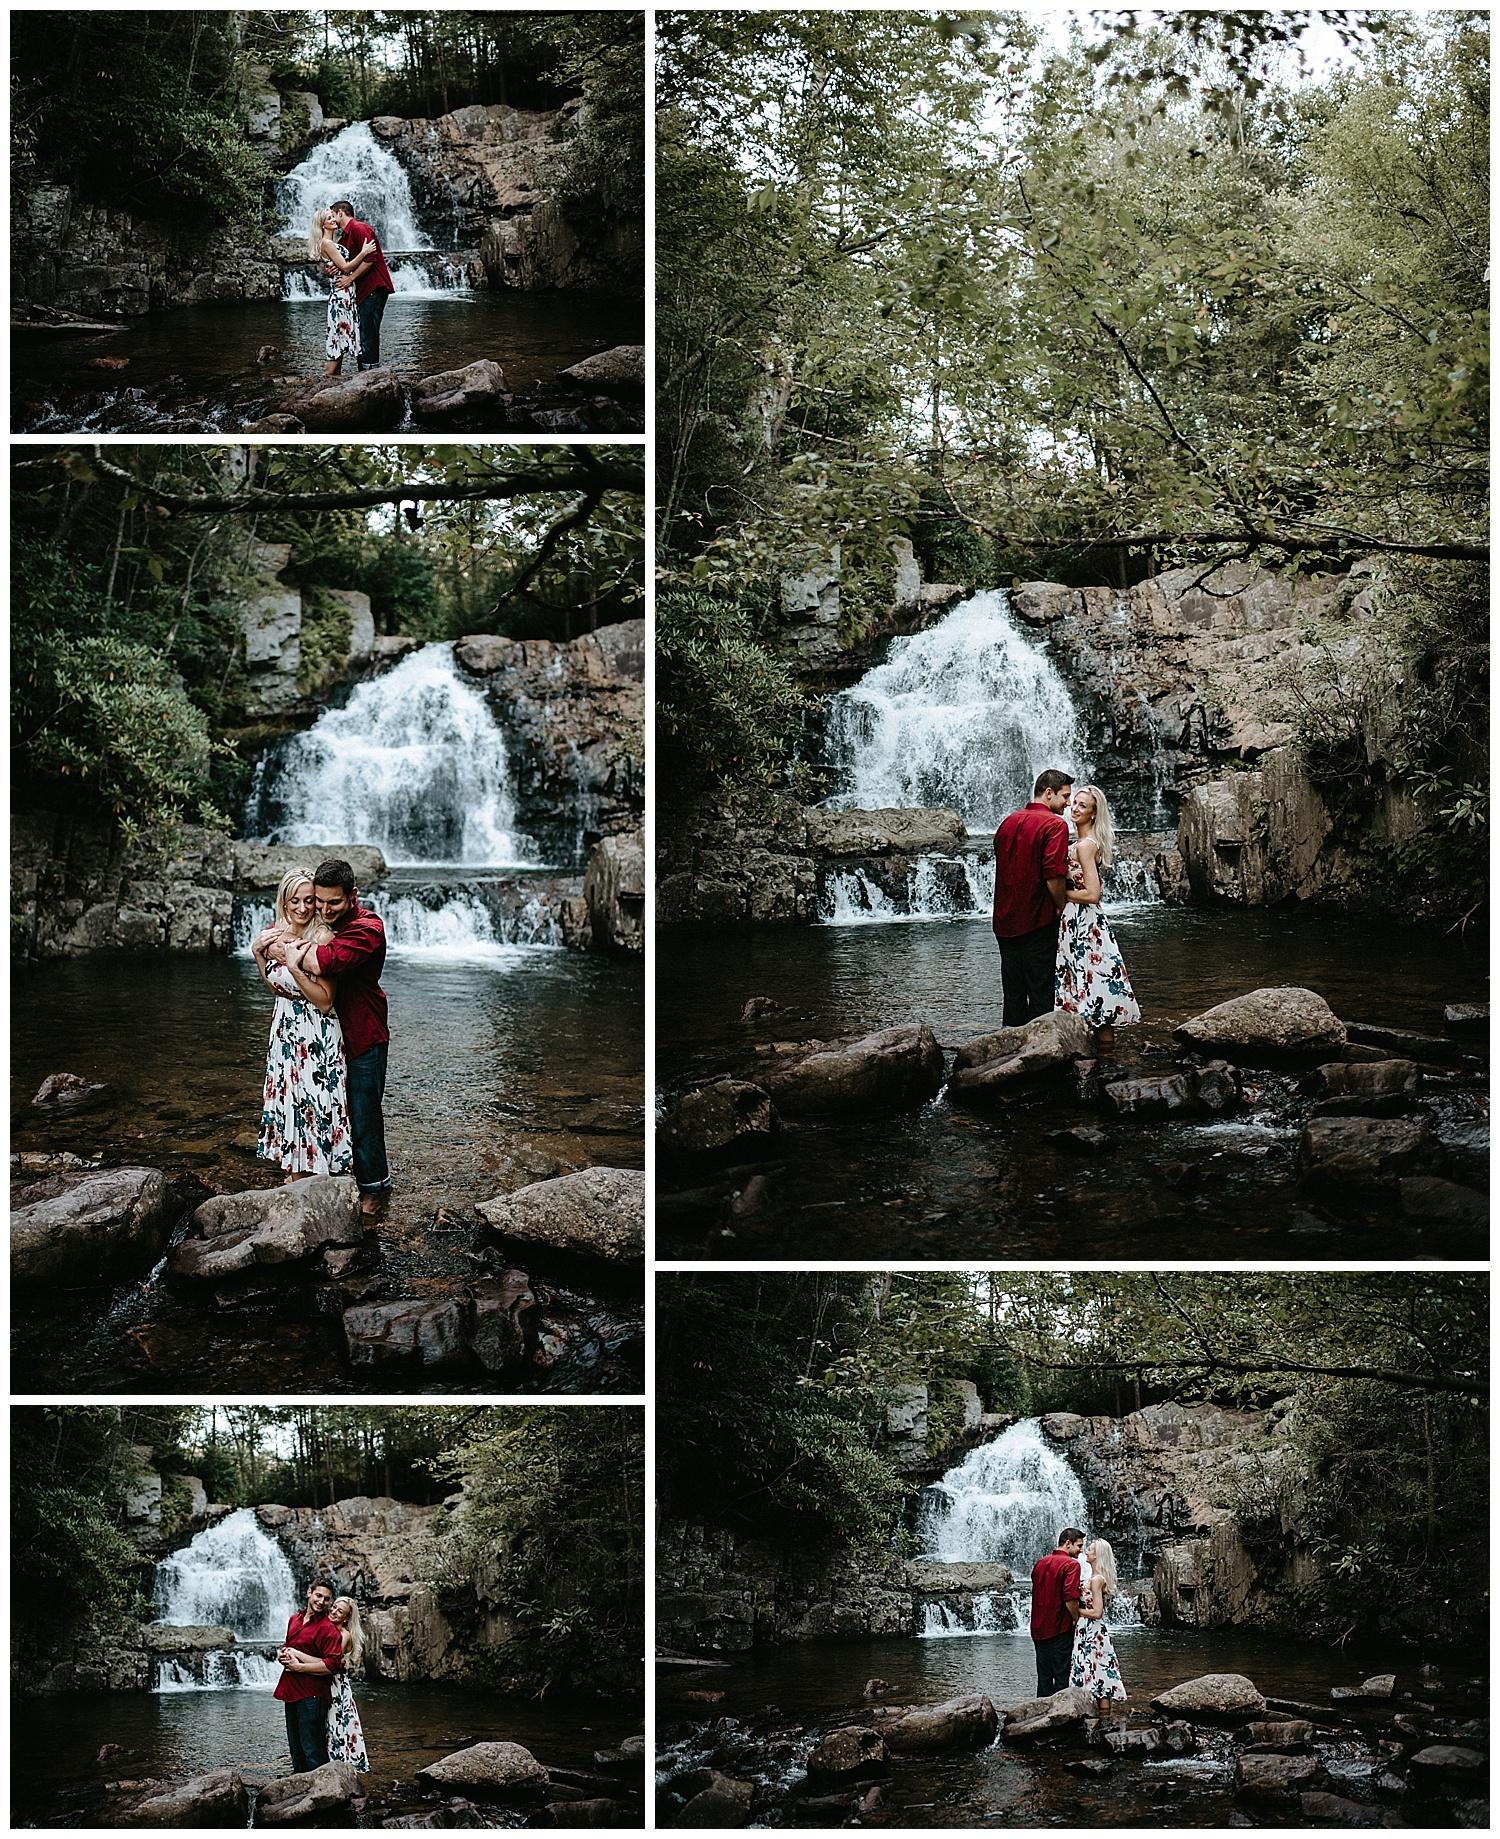 NEPA-Wedding-Engagement-Photographer-at-Hickory-Run-state-park_0008.jpg